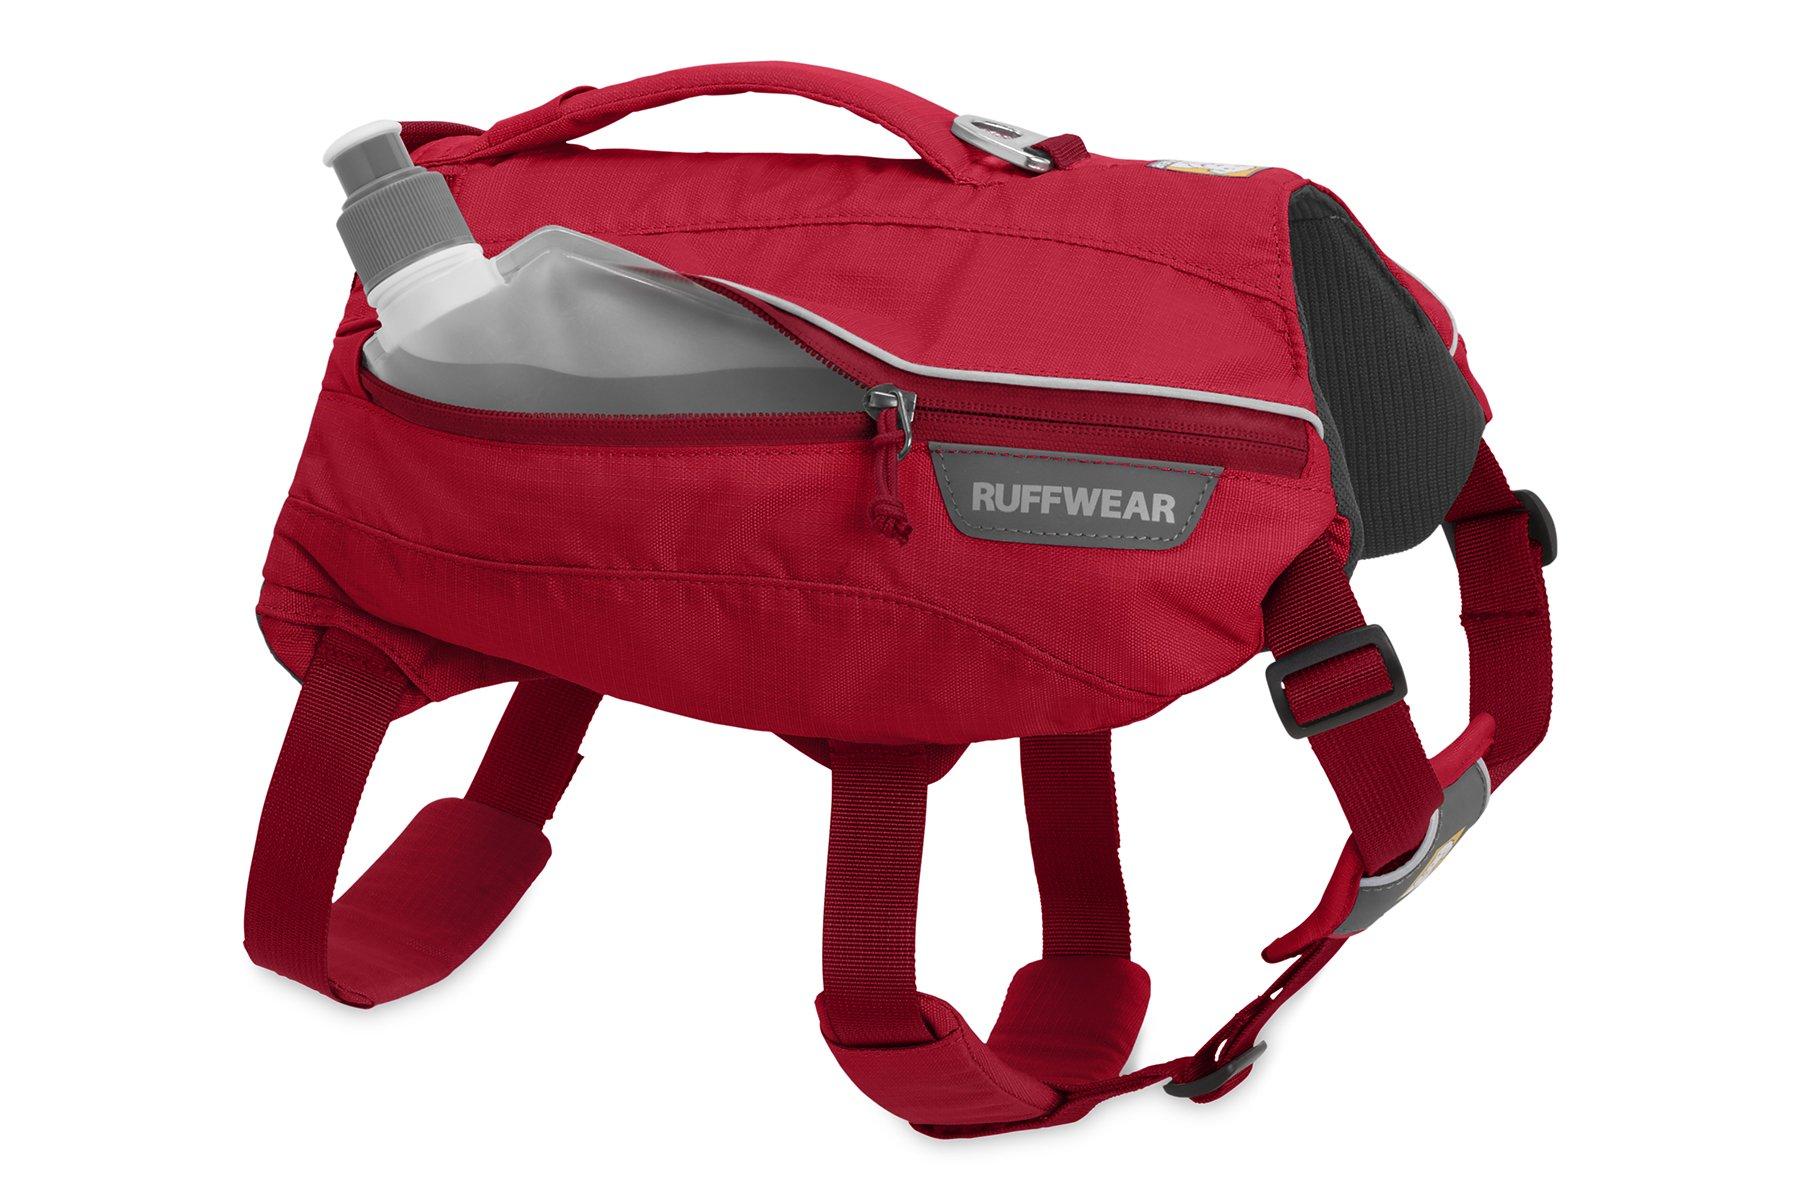 RUFFWEAR - Singletrak Hydration Pack for Dogs, Red Currant, Medium by RUFFWEAR (Image #6)